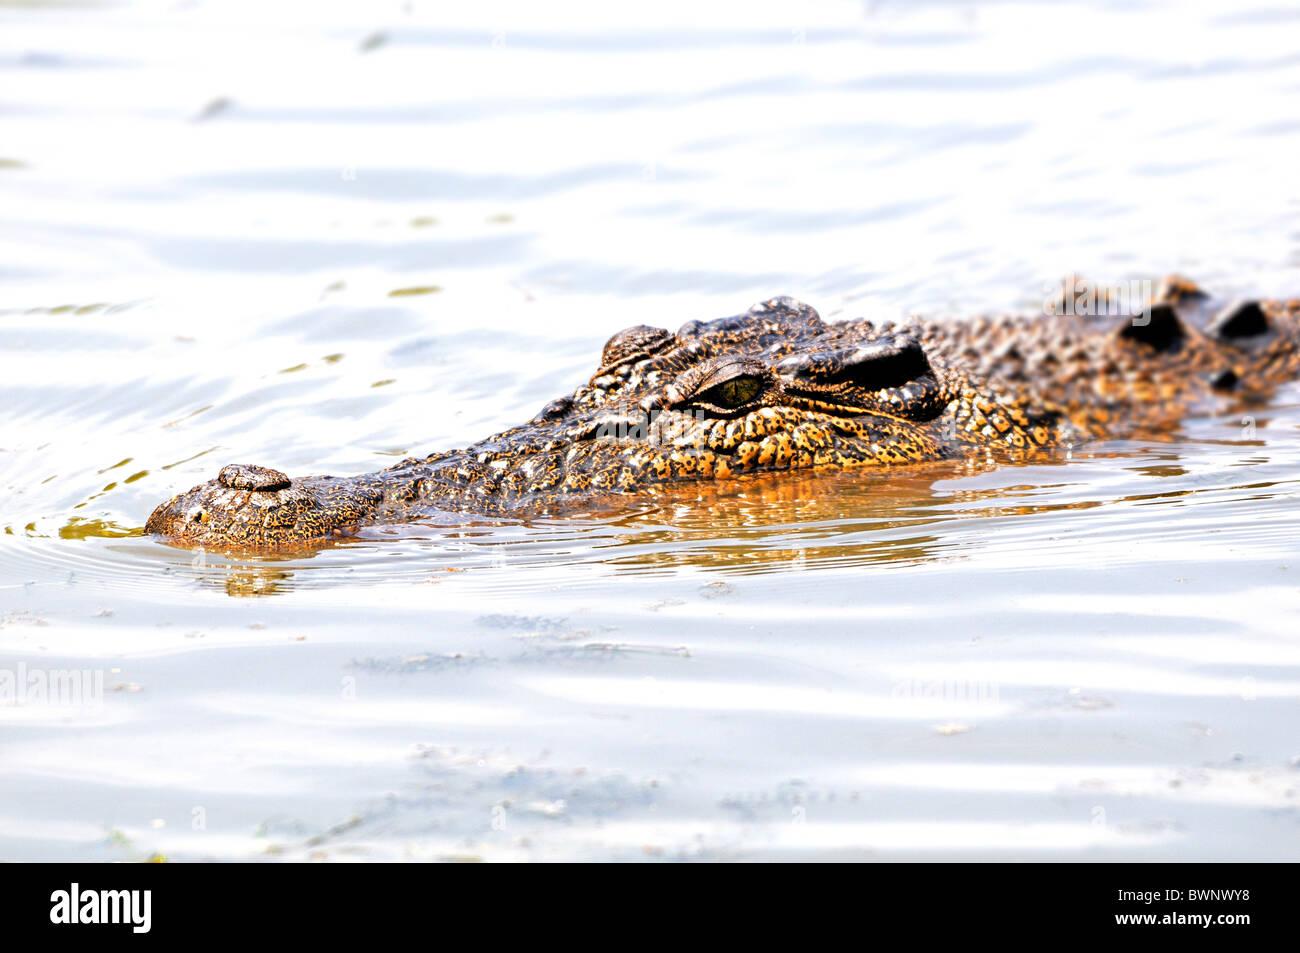 Crocodile swimming in East Alligator River, Kakadu, Top End, Northern Territory, Australia - Stock Image